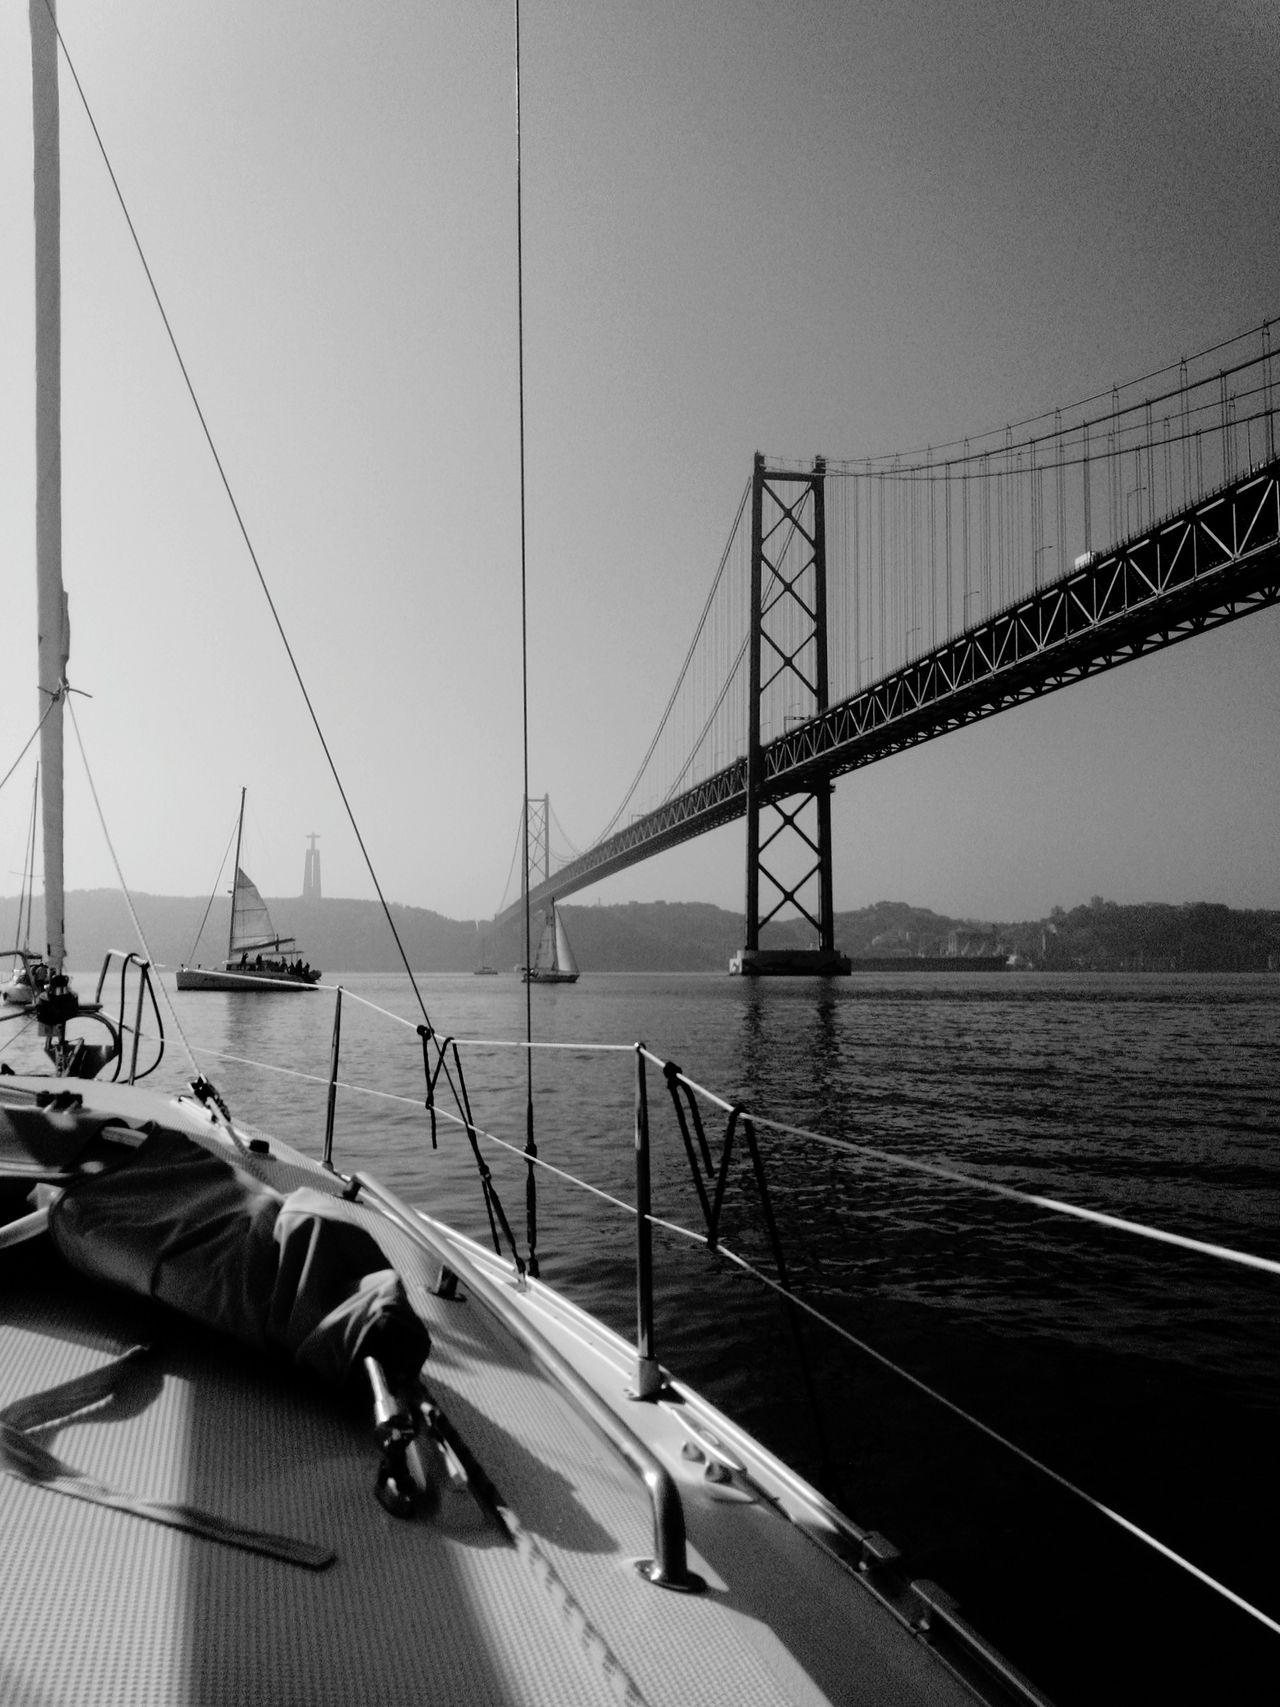 Lisbonbridge Lisbon Lisbon Statue Lisboa Portugal Boat View Boat Ride Boat On A Boat Bridge Almadaview